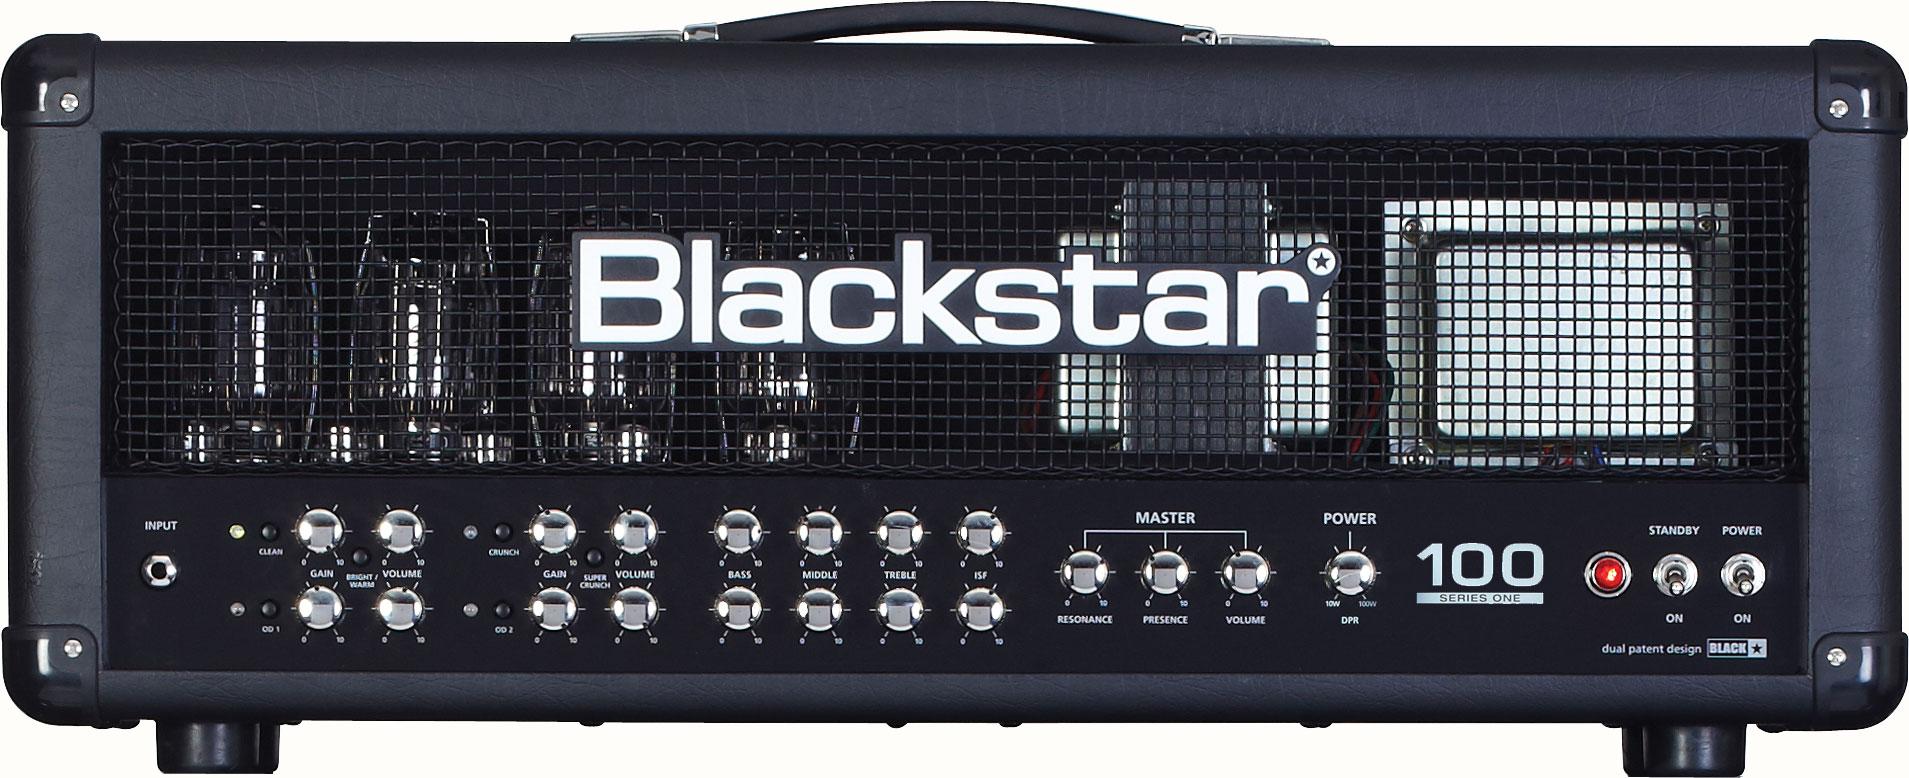 BLACKSTAR S1-104EL34